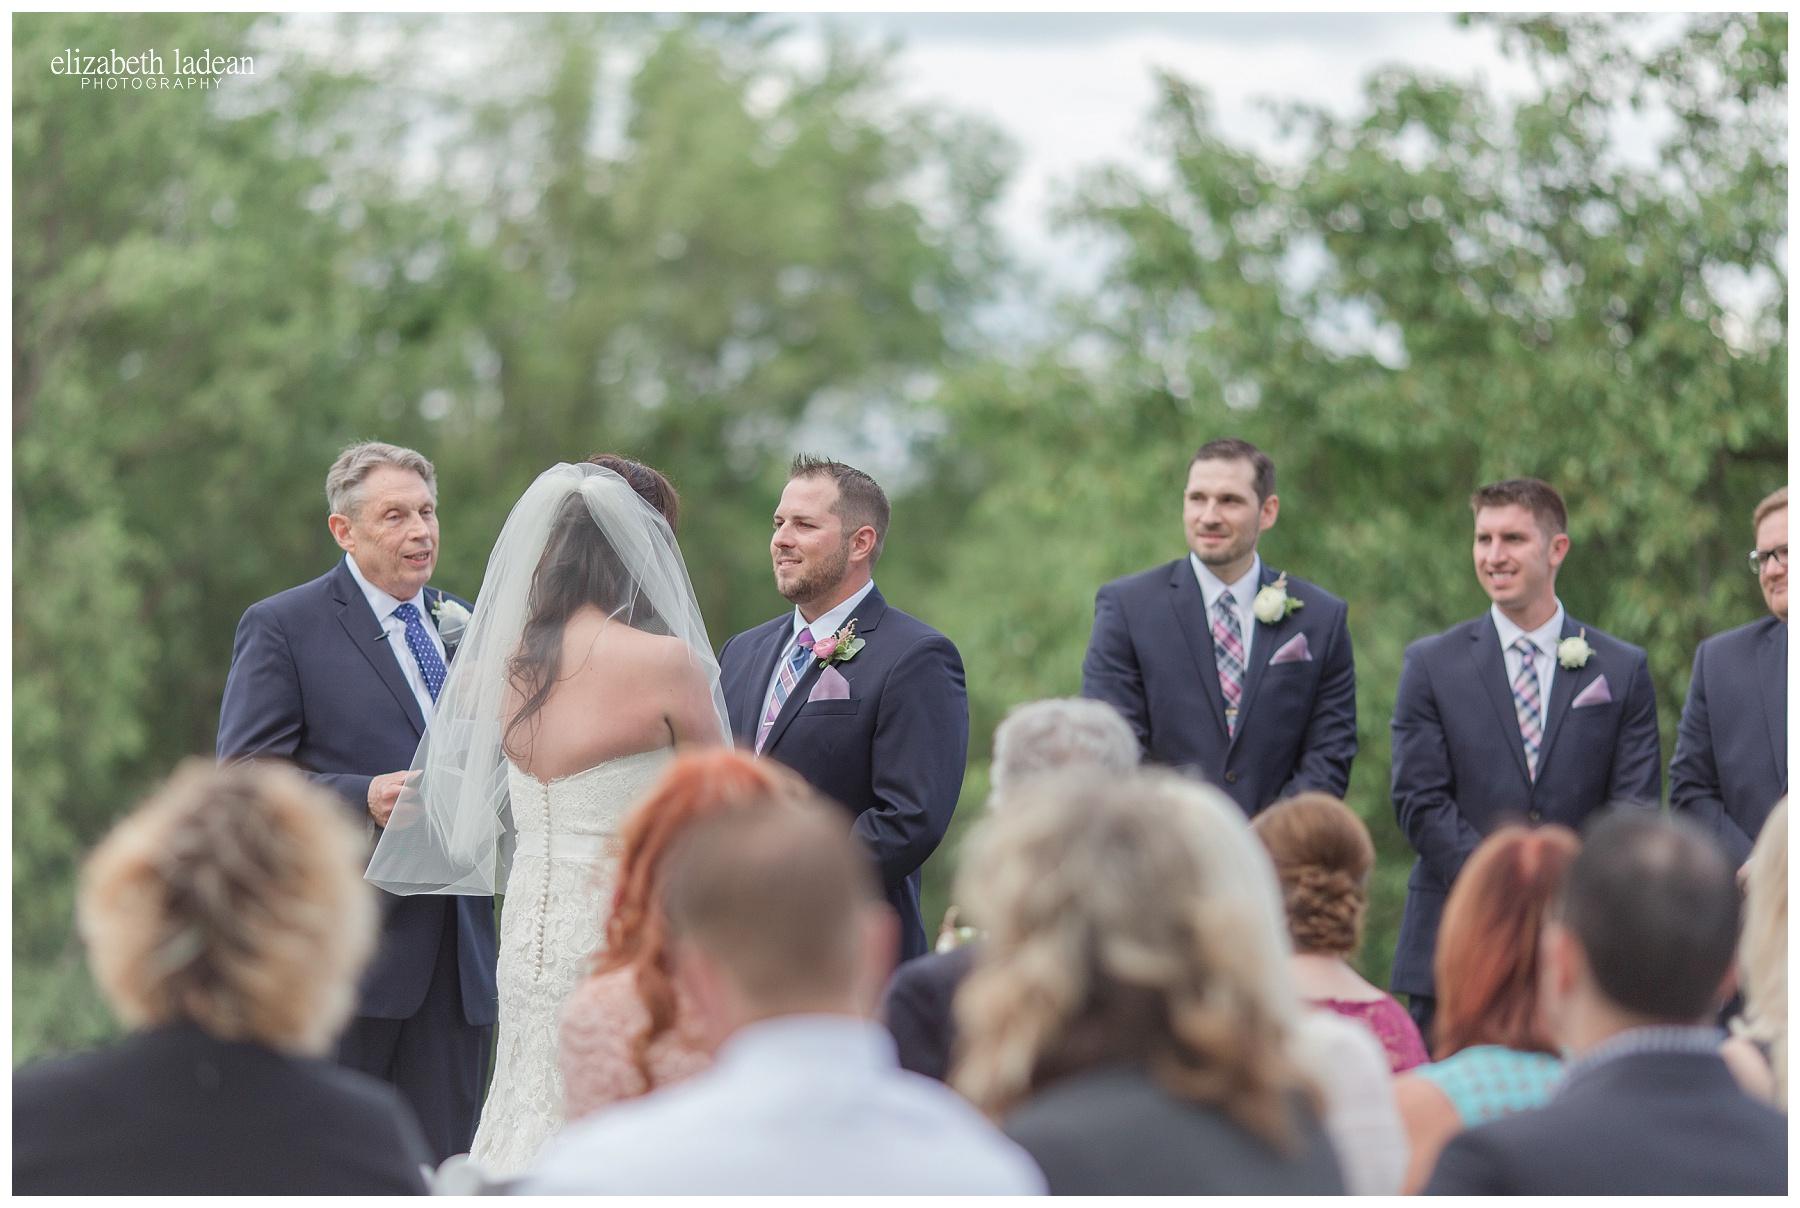 Hillcrest-Country-Club-Kansas-City-Wedding-Photography-E+J-0520-Elizabeth-Ladean-Photography-photo_0842.jpg